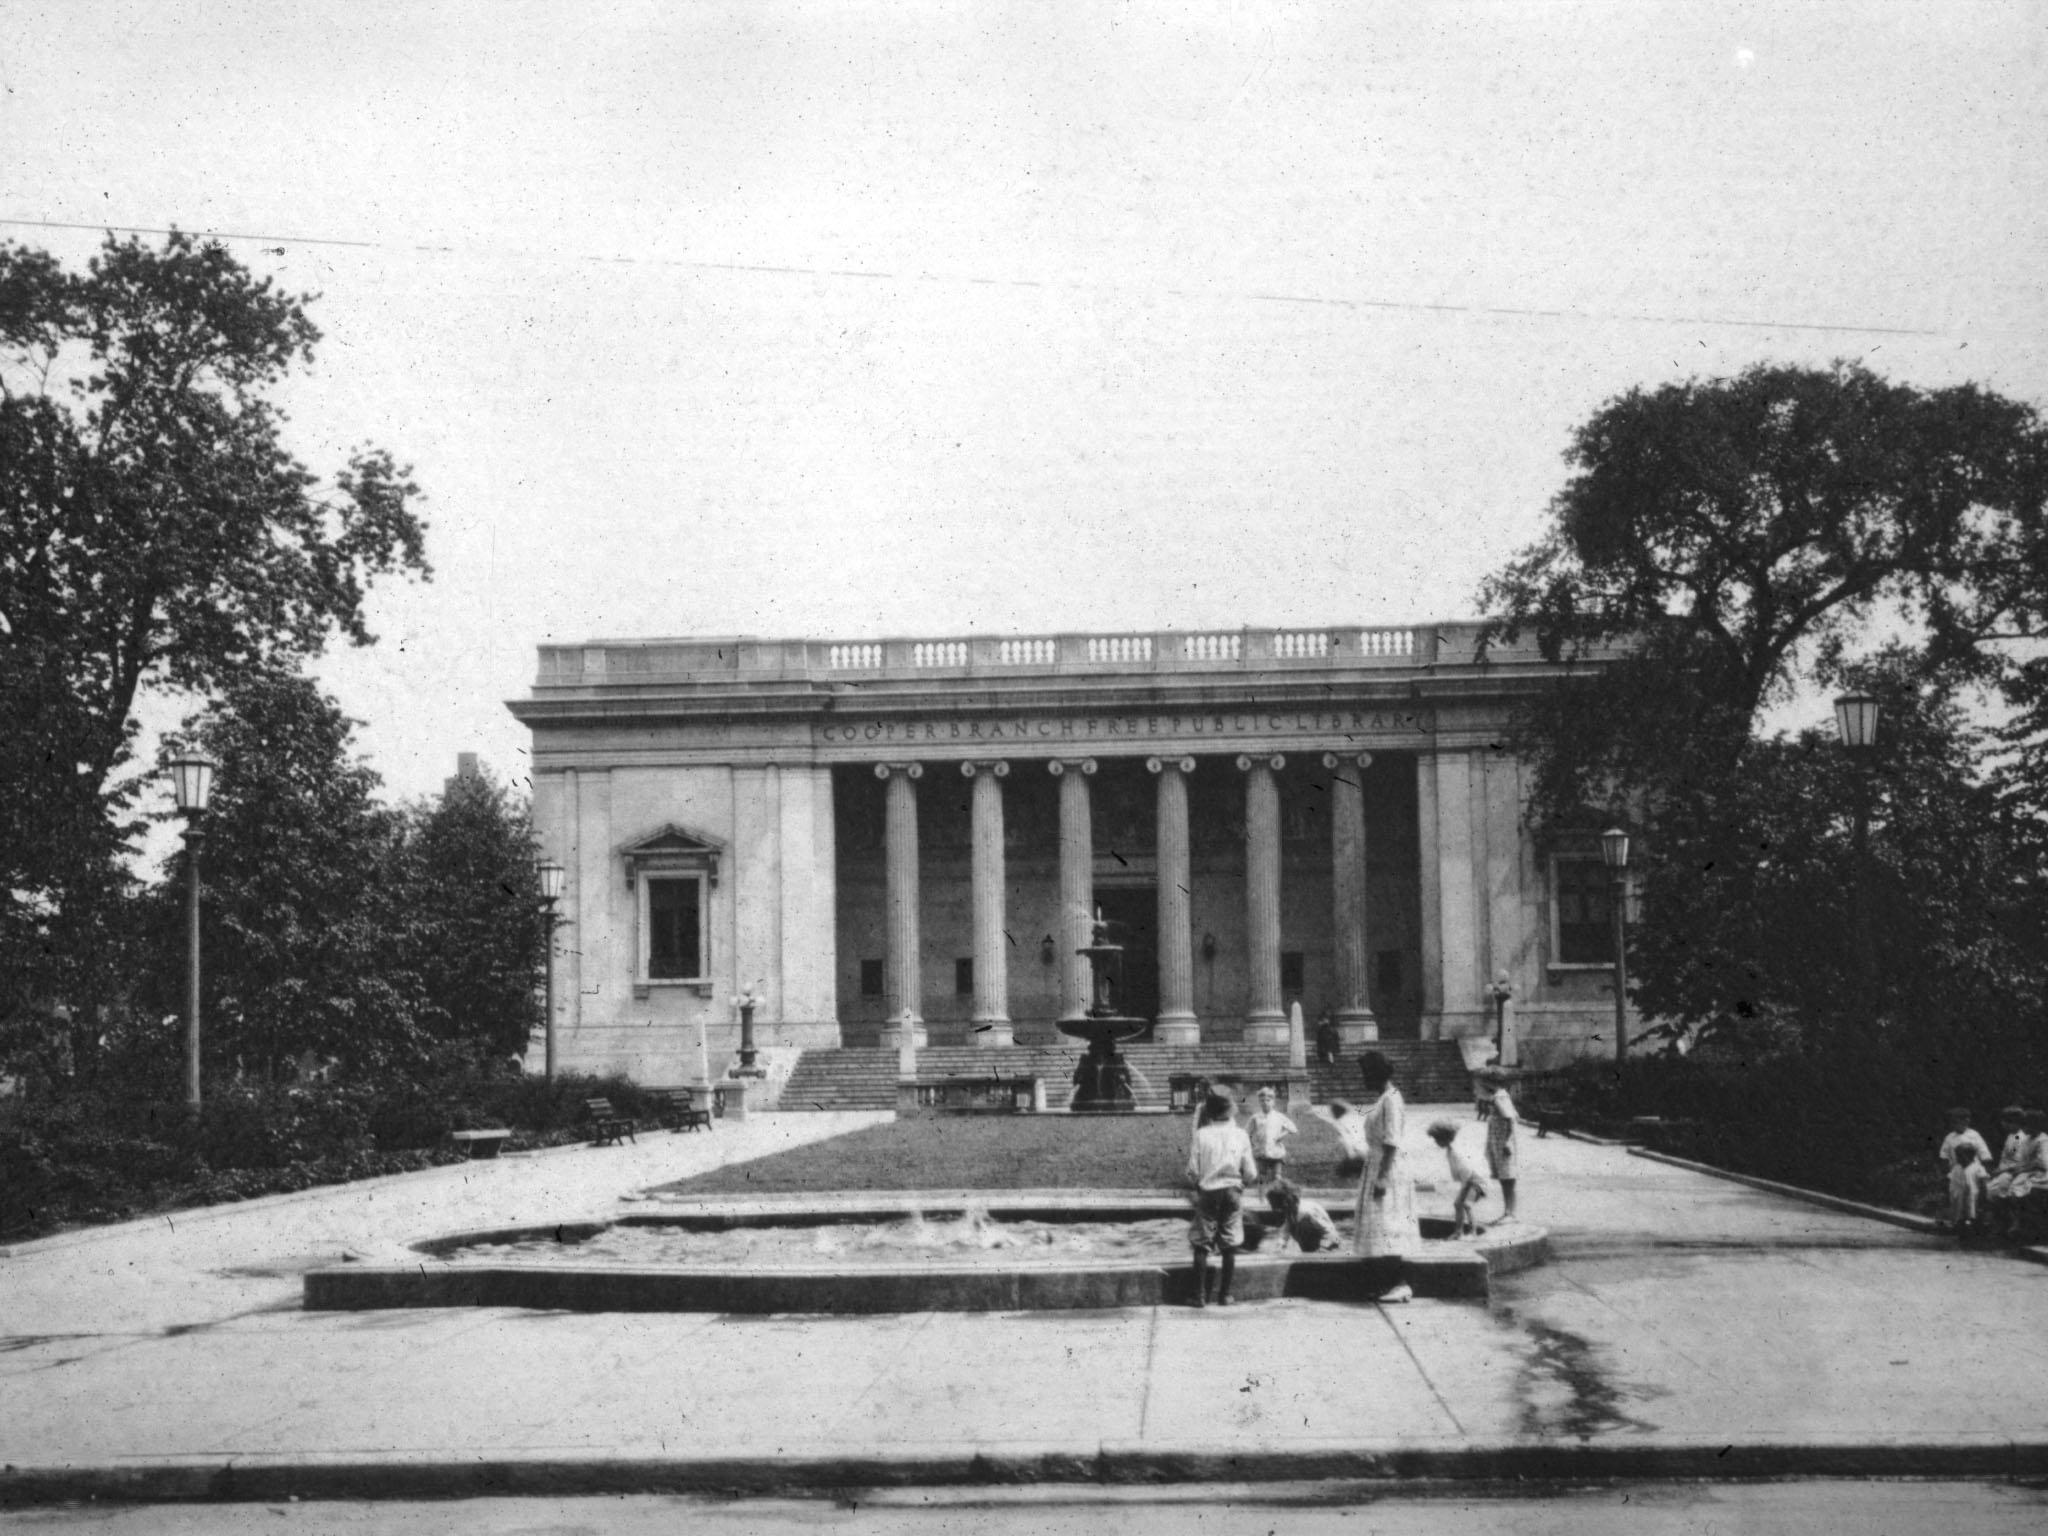 Cooper Library, Johnson Park